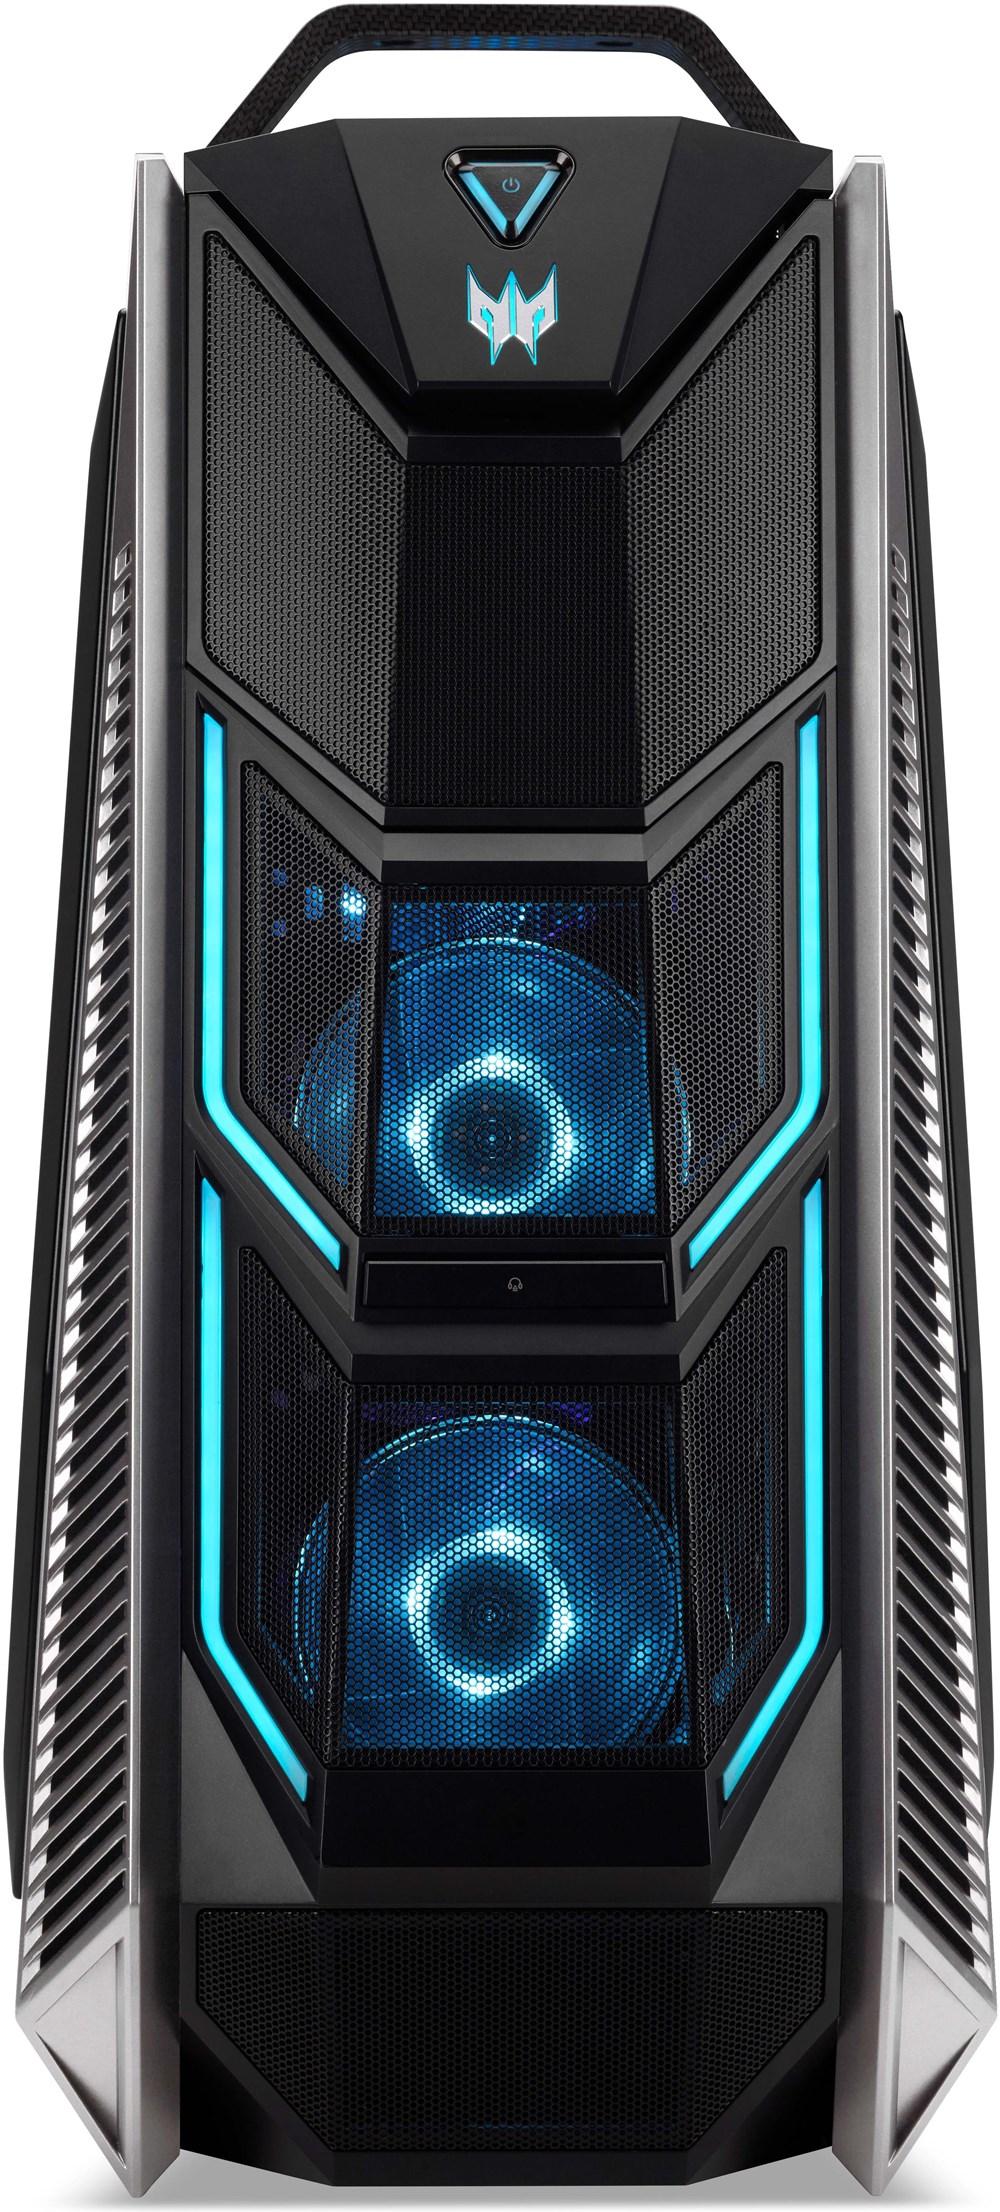 Obrázok produktu Acer PREDATOR Orion 9000 - i7-7800X/ 512SSD+3TB/ 2*16G/ RTX2080Ti/ DVD/ W10